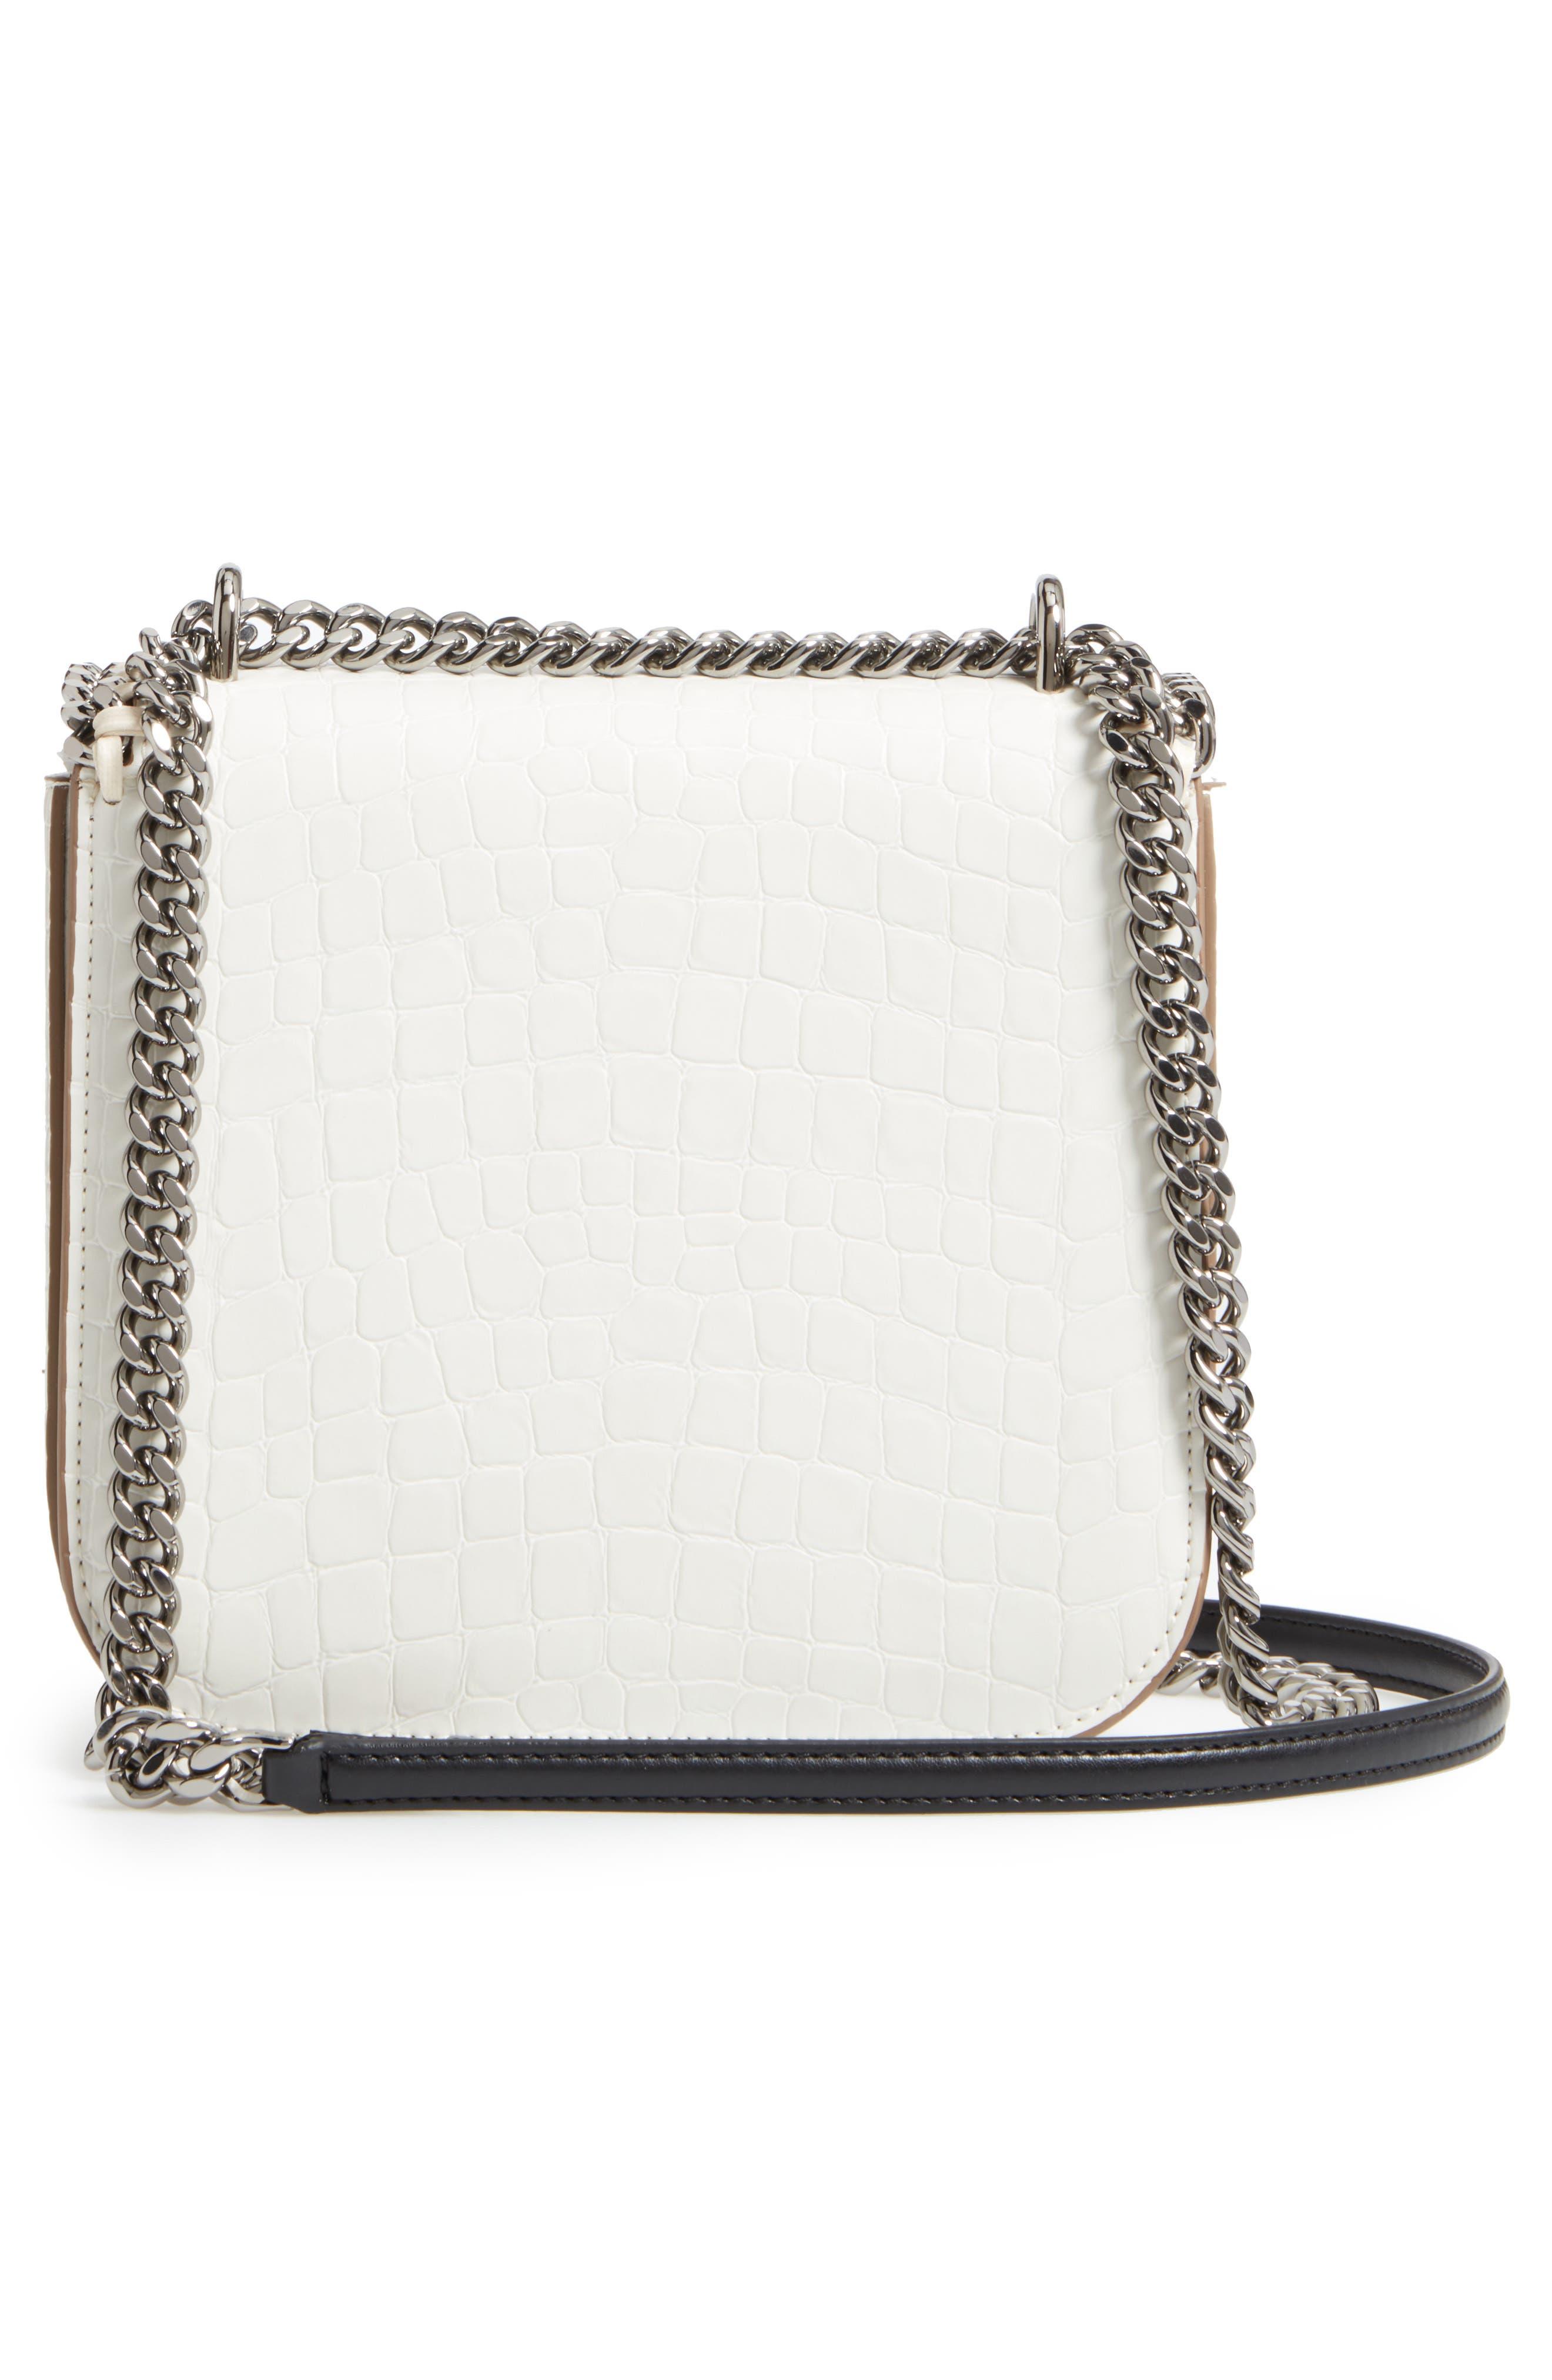 Medium Falabella Box Croc-Embossed Faux Leather Shoulder Bag,                             Alternate thumbnail 3, color,                             102